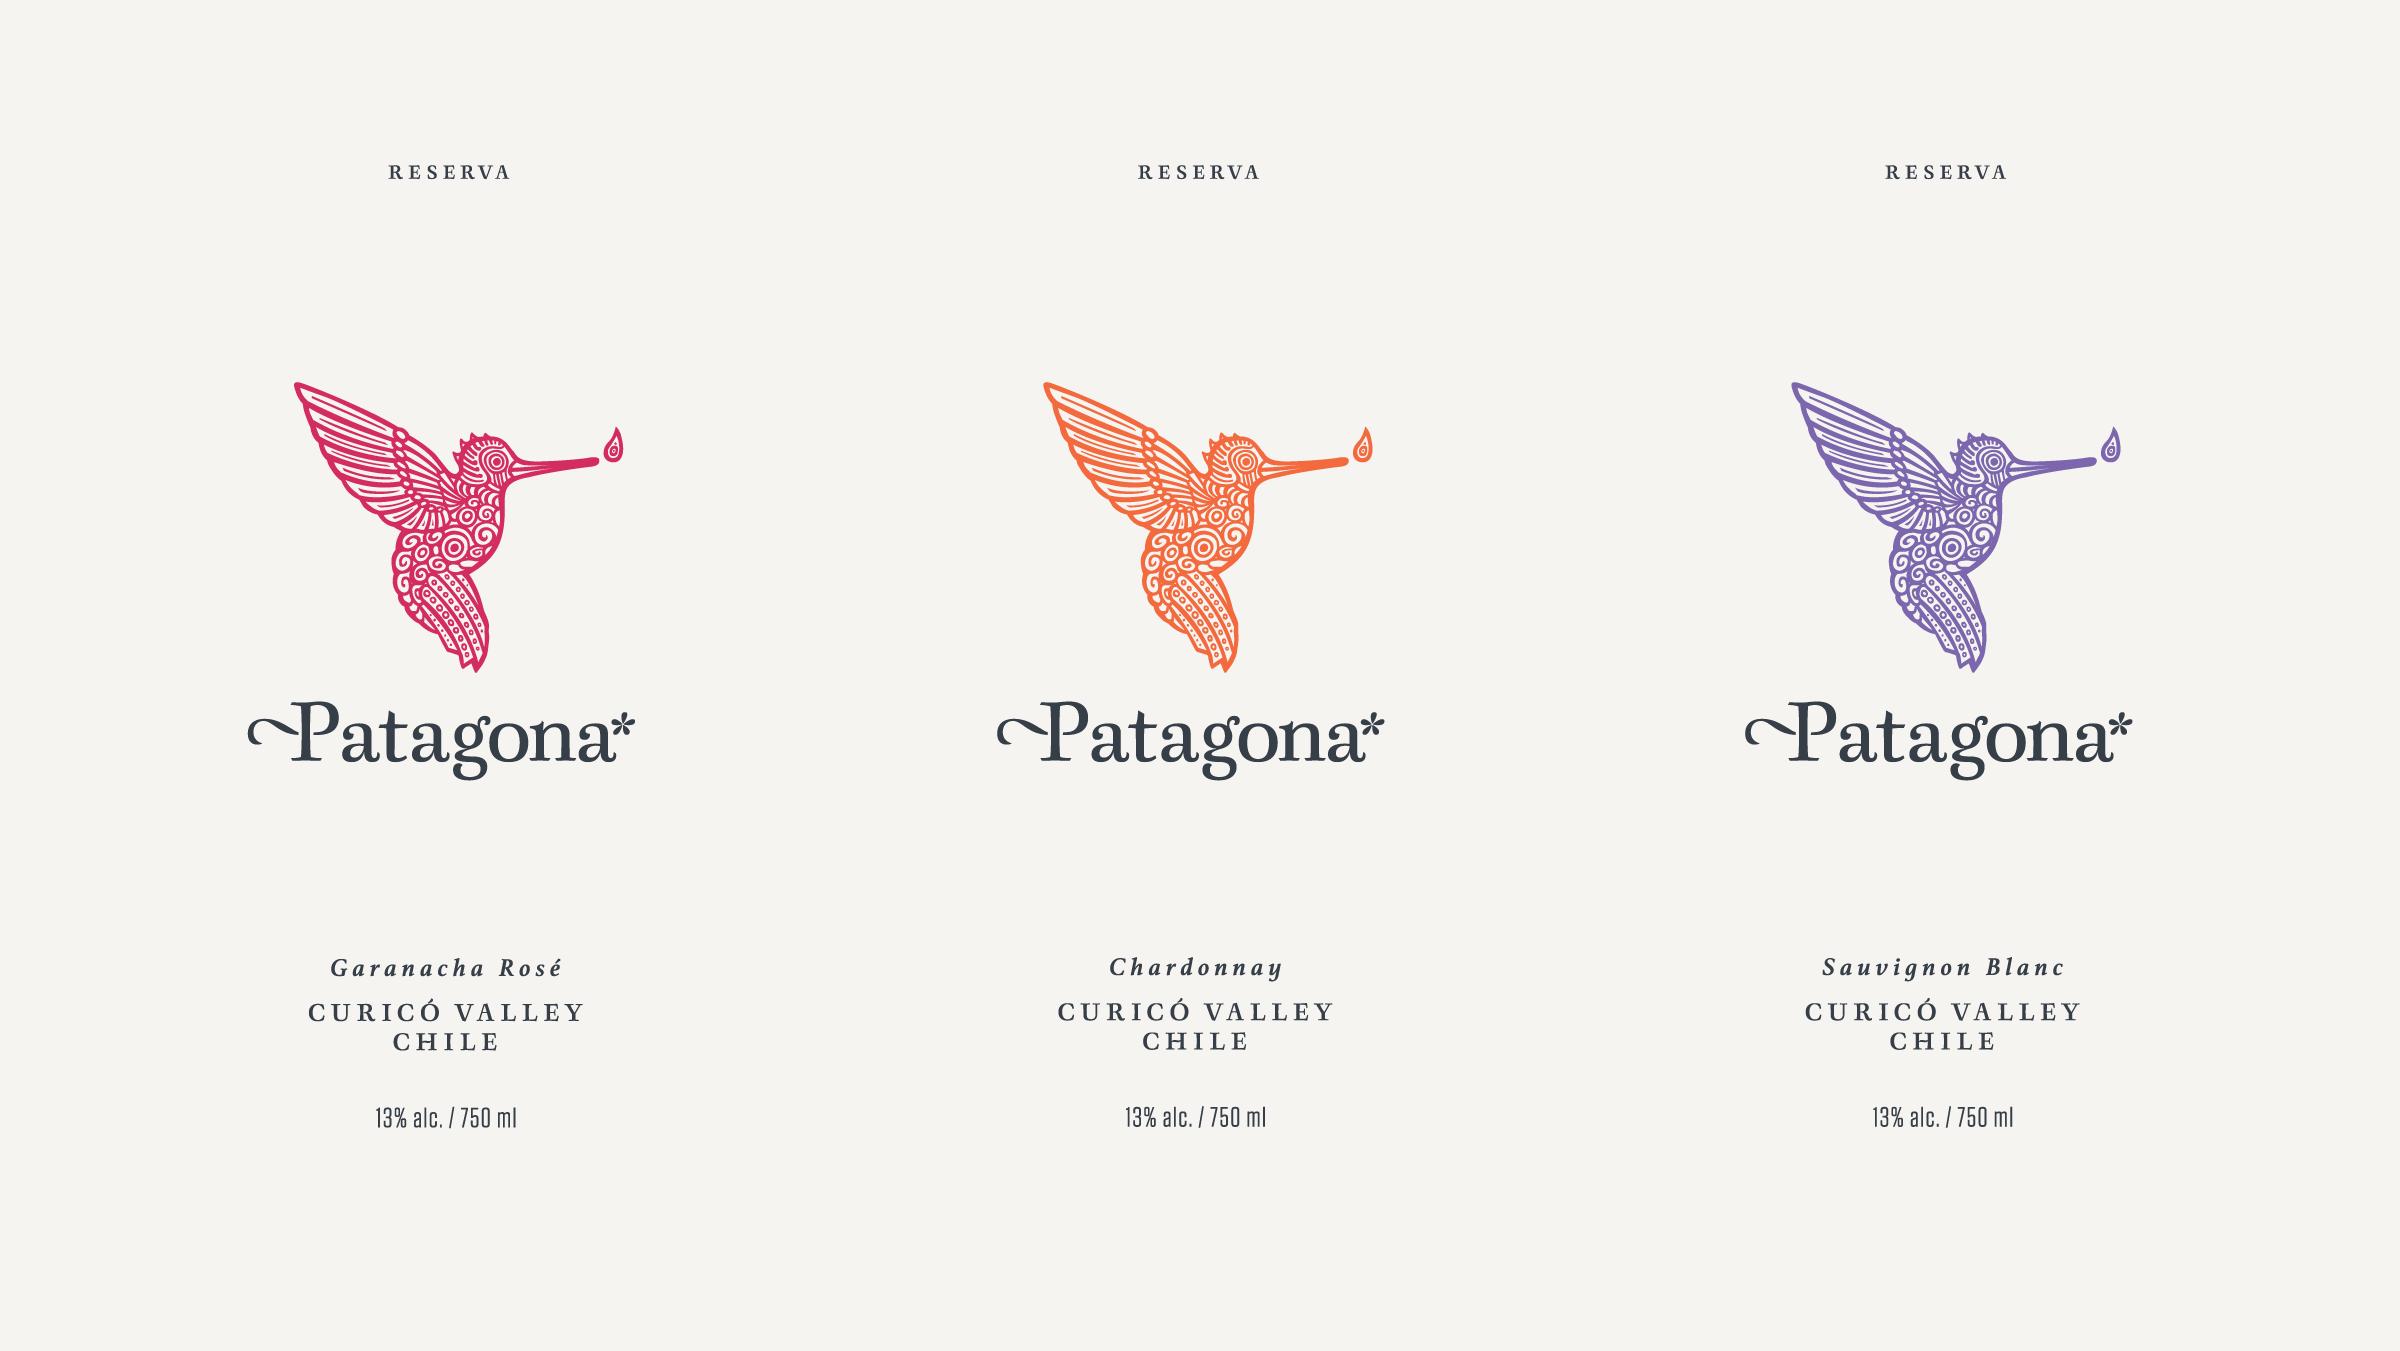 Patagona-Packaging-Graphics-1